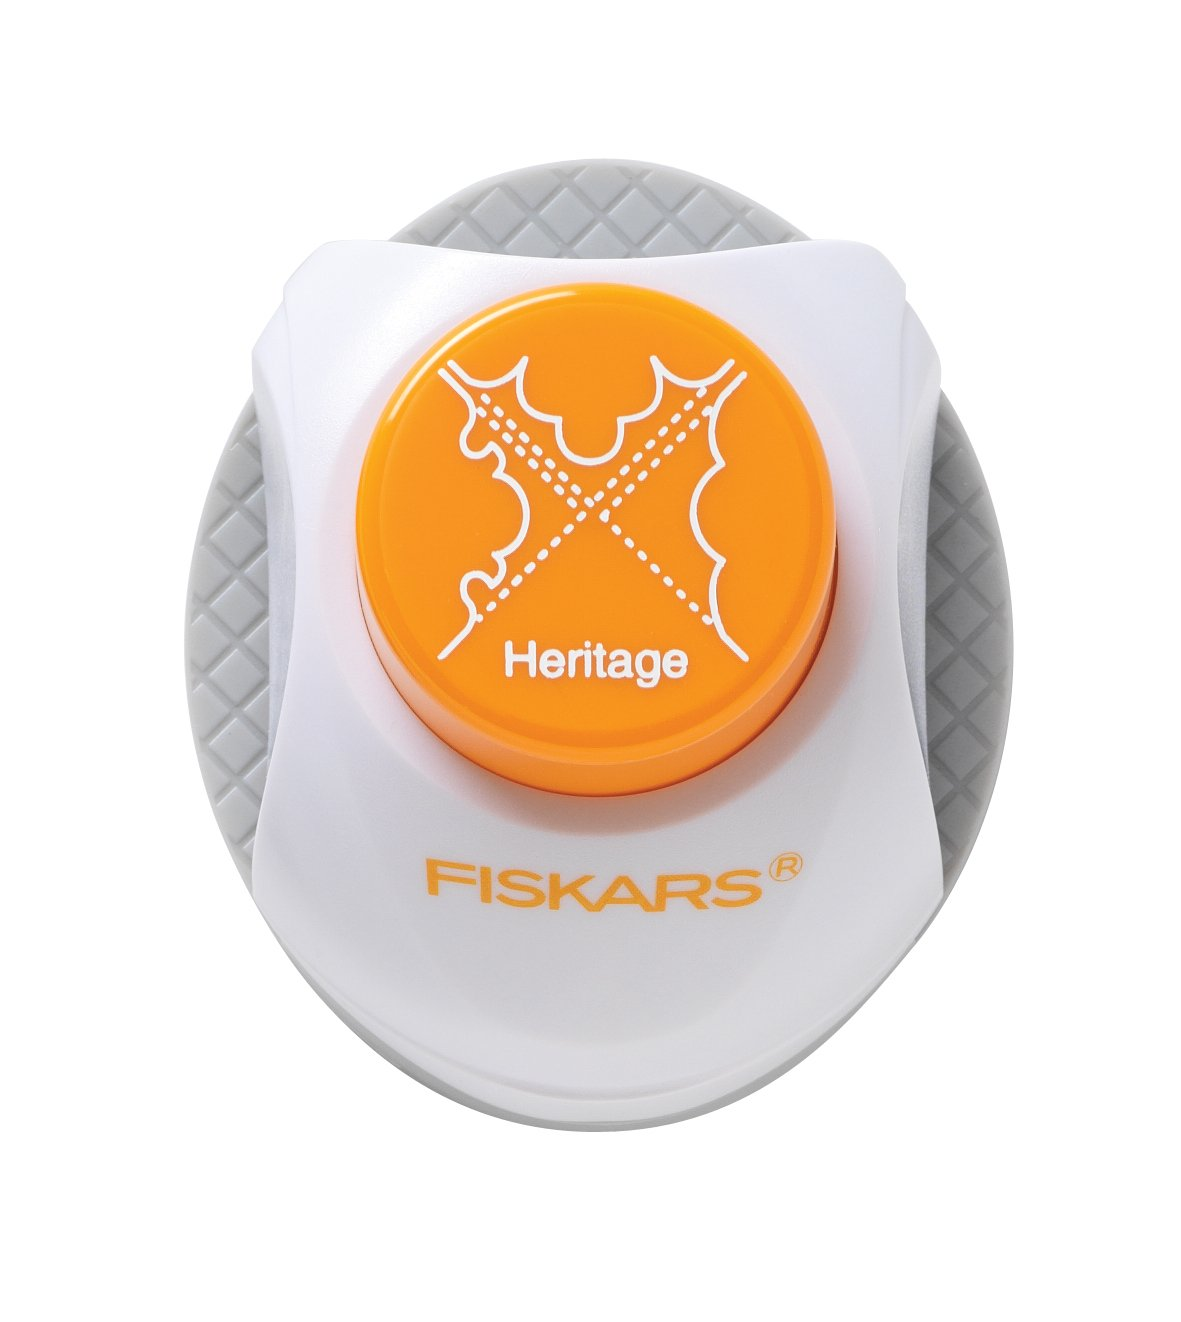 Fiskars 01-005225 3 in 1 Corner Punch Sea Pearls